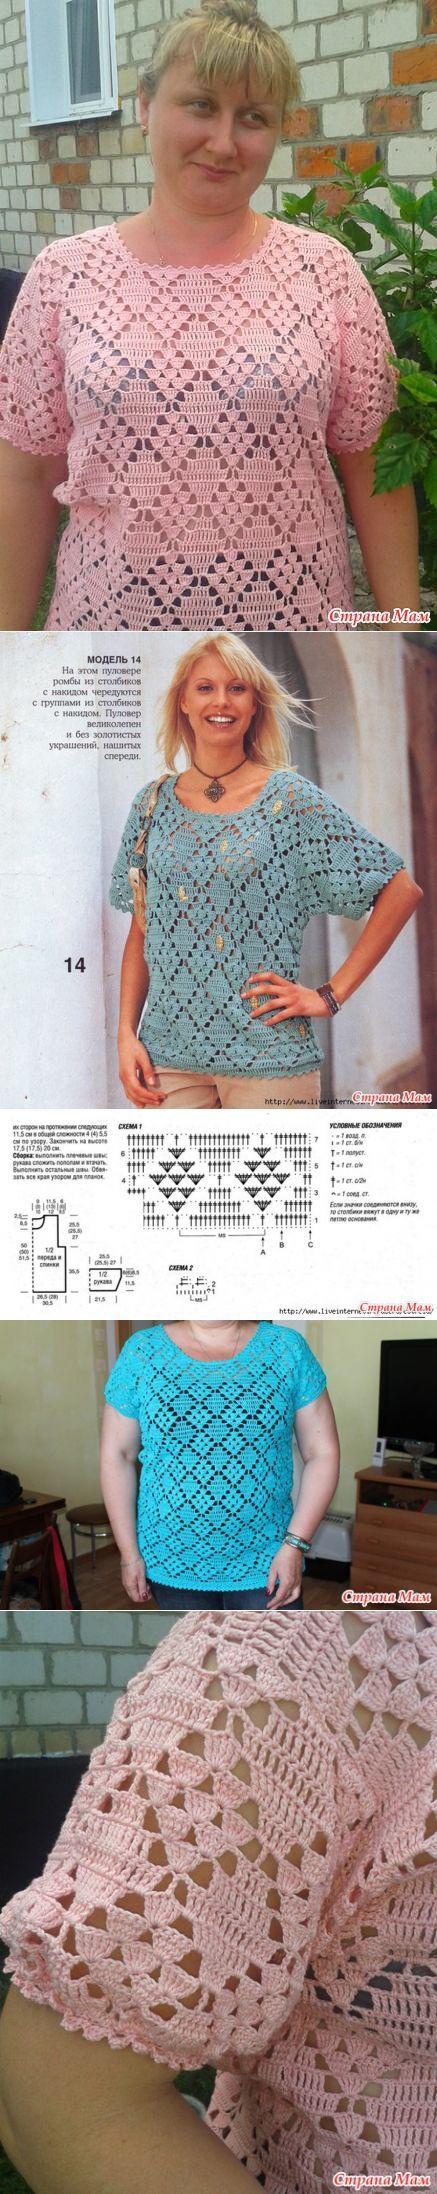 Летний пуловер крючком - ВЯЗАНАЯ МОДА+ ДЛЯ НЕМОДЕЛЬНЫХ ДАМ - Страна Мам [] #<br/> # #Crochet #Clothes,<br/> # #Crochet #Tops,<br/> # #Filet #Crochet,<br/> # #Crochet #Patterns,<br/> # #Posts,<br/> # #Kazakhstan,<br/> # #Crochet #Jacket,<br/> # #Pullover,<br/> # #Wobbly<br/>